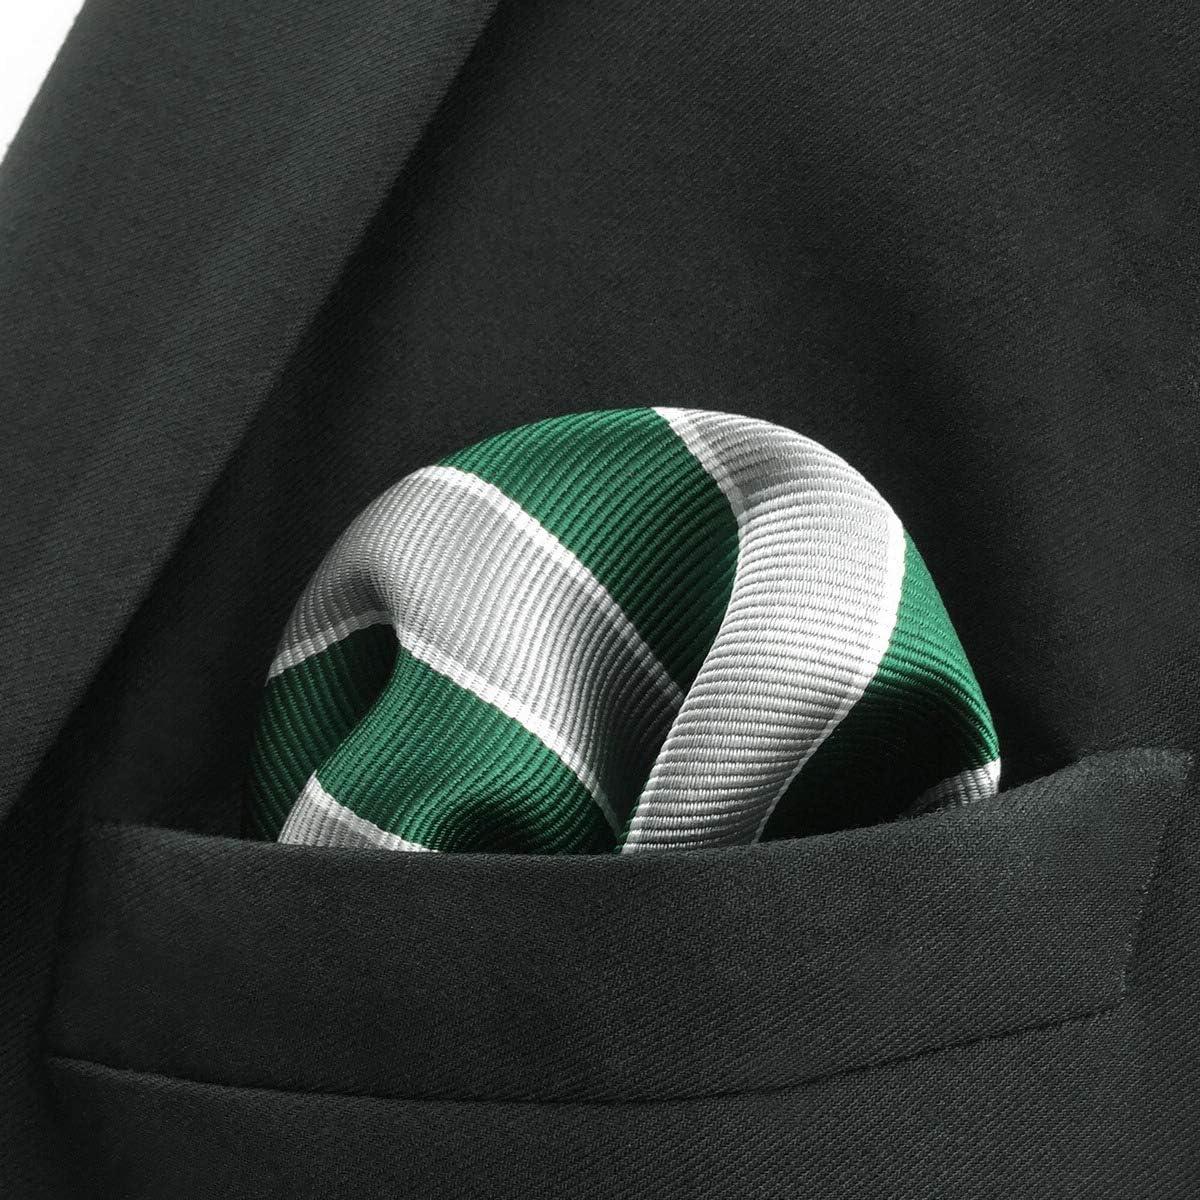 SHLAX/&WING Ties for Men Stripes Silk Mens Necktie Grey Green Jacquard Weave